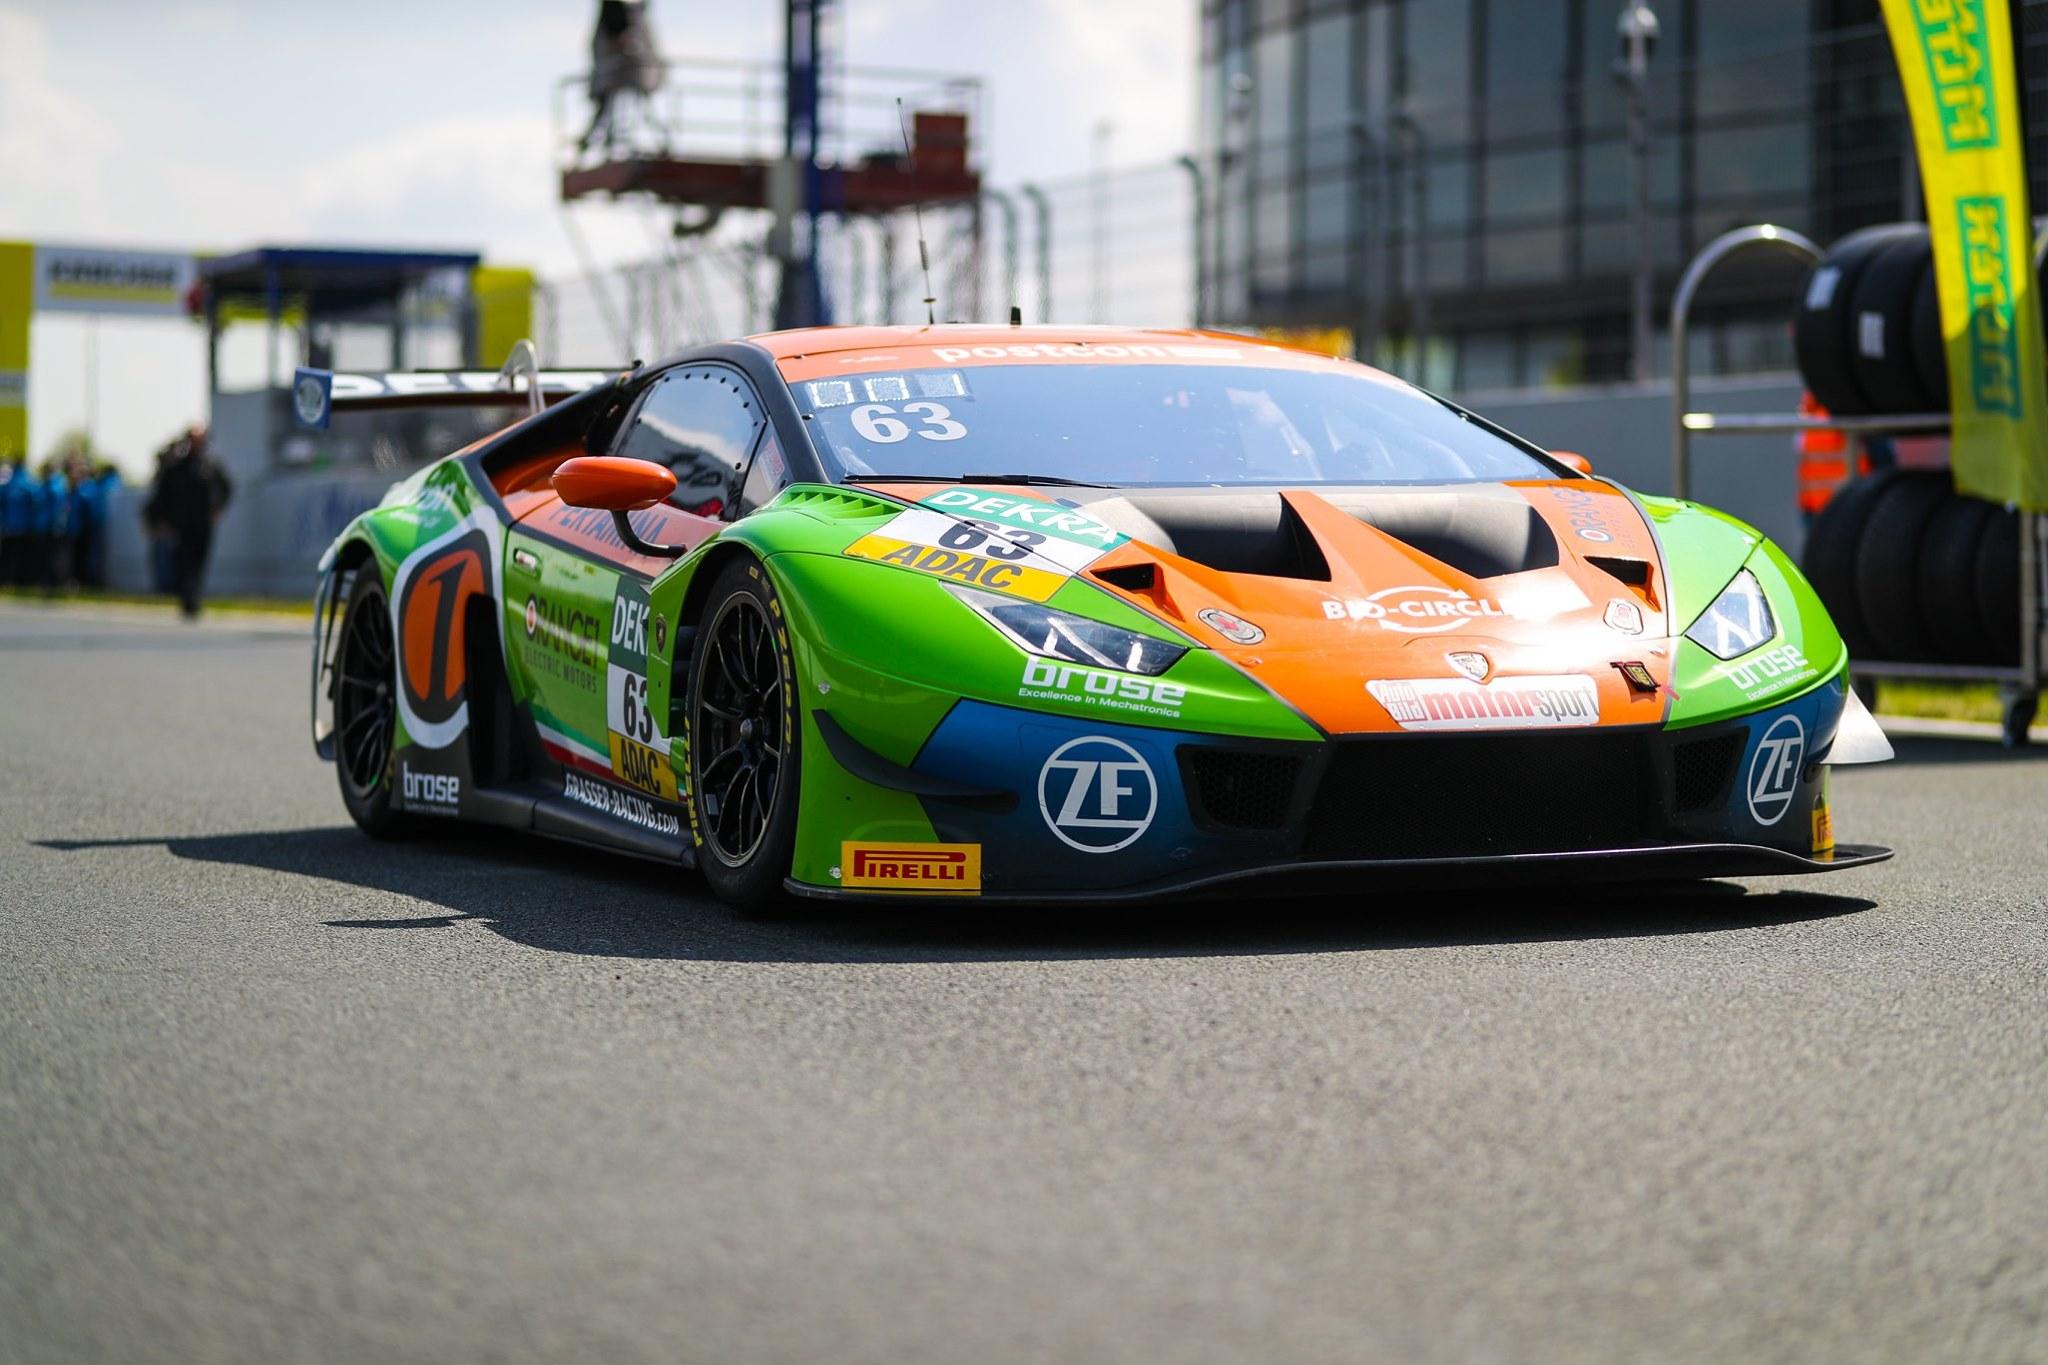 Podium in ADAC GT Masters season opener at Oschersleben